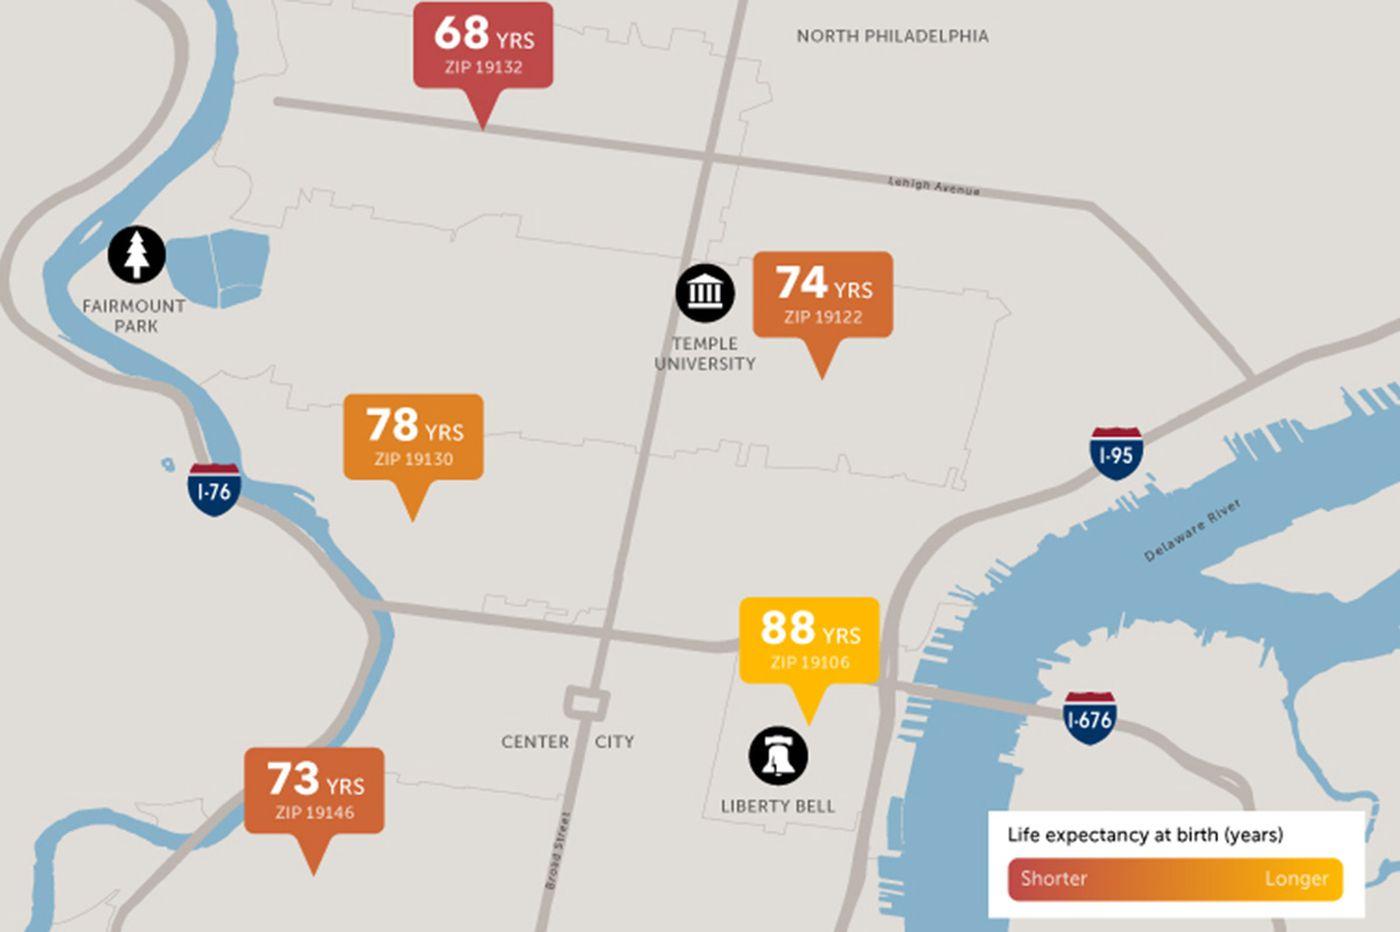 How Your Neighborhood Can Impact Your Life Expectancy In Philadelphia